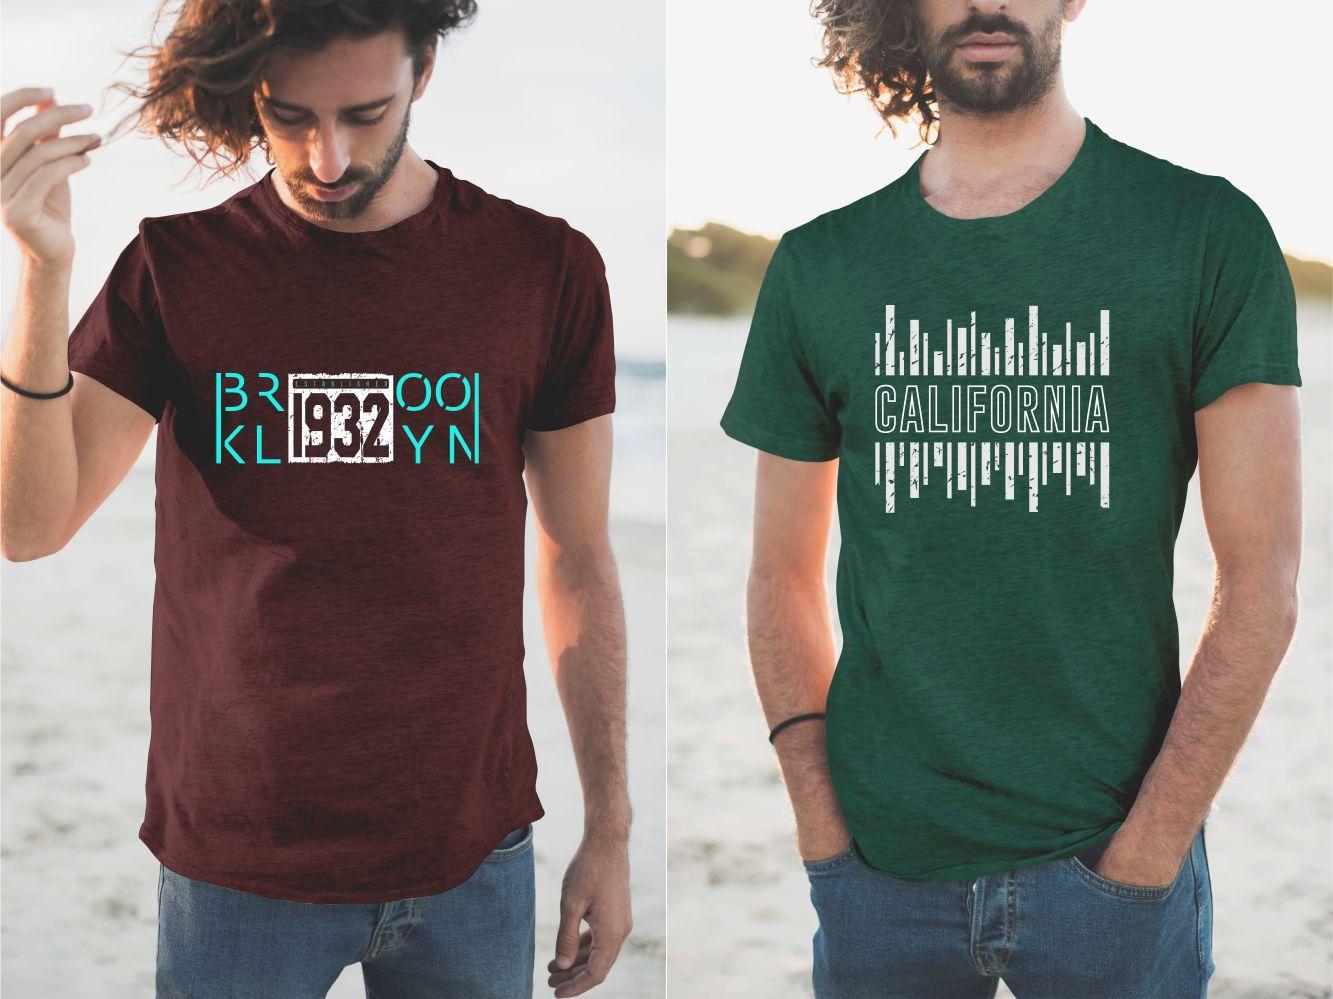 106 Urban T-shirt Designs Collection - 43 1